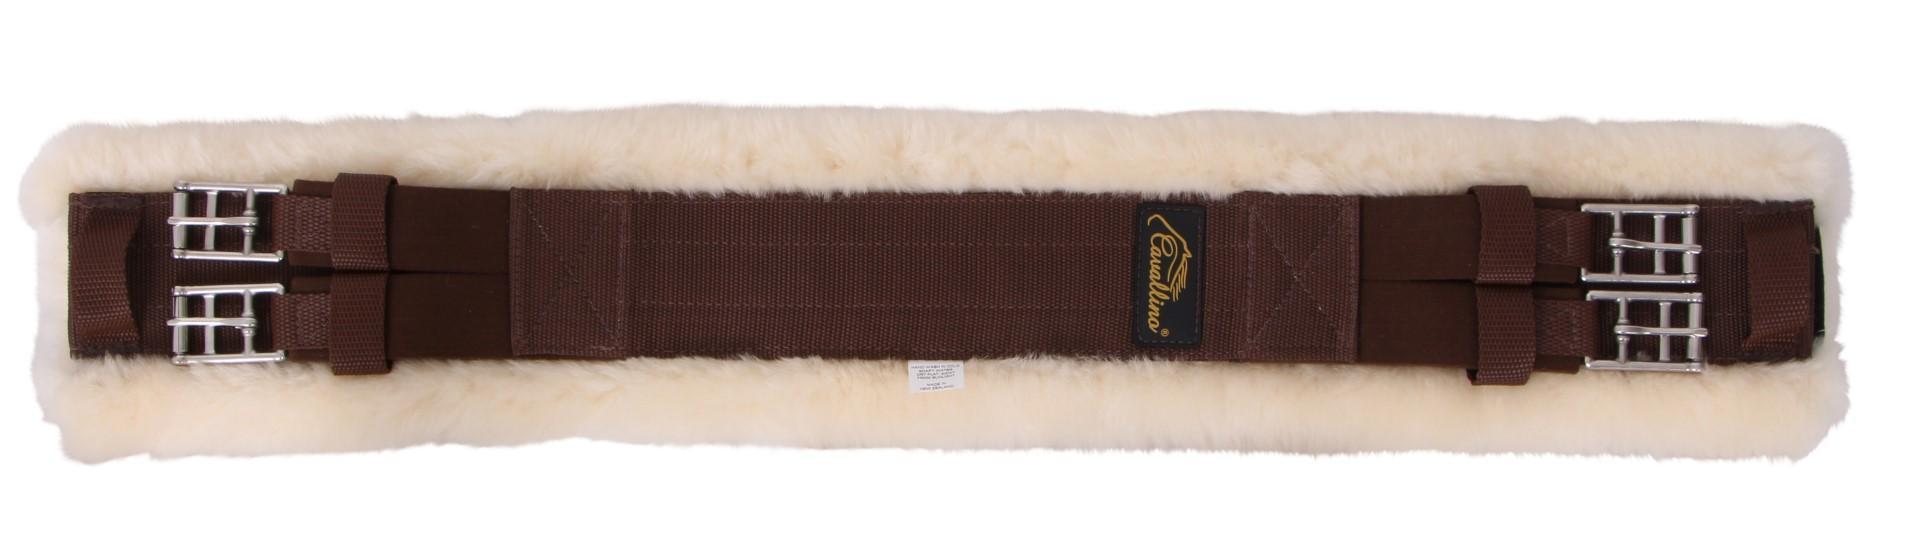 Comfi Tech Lambswool Dressage Girth Horsewyse Saddlery